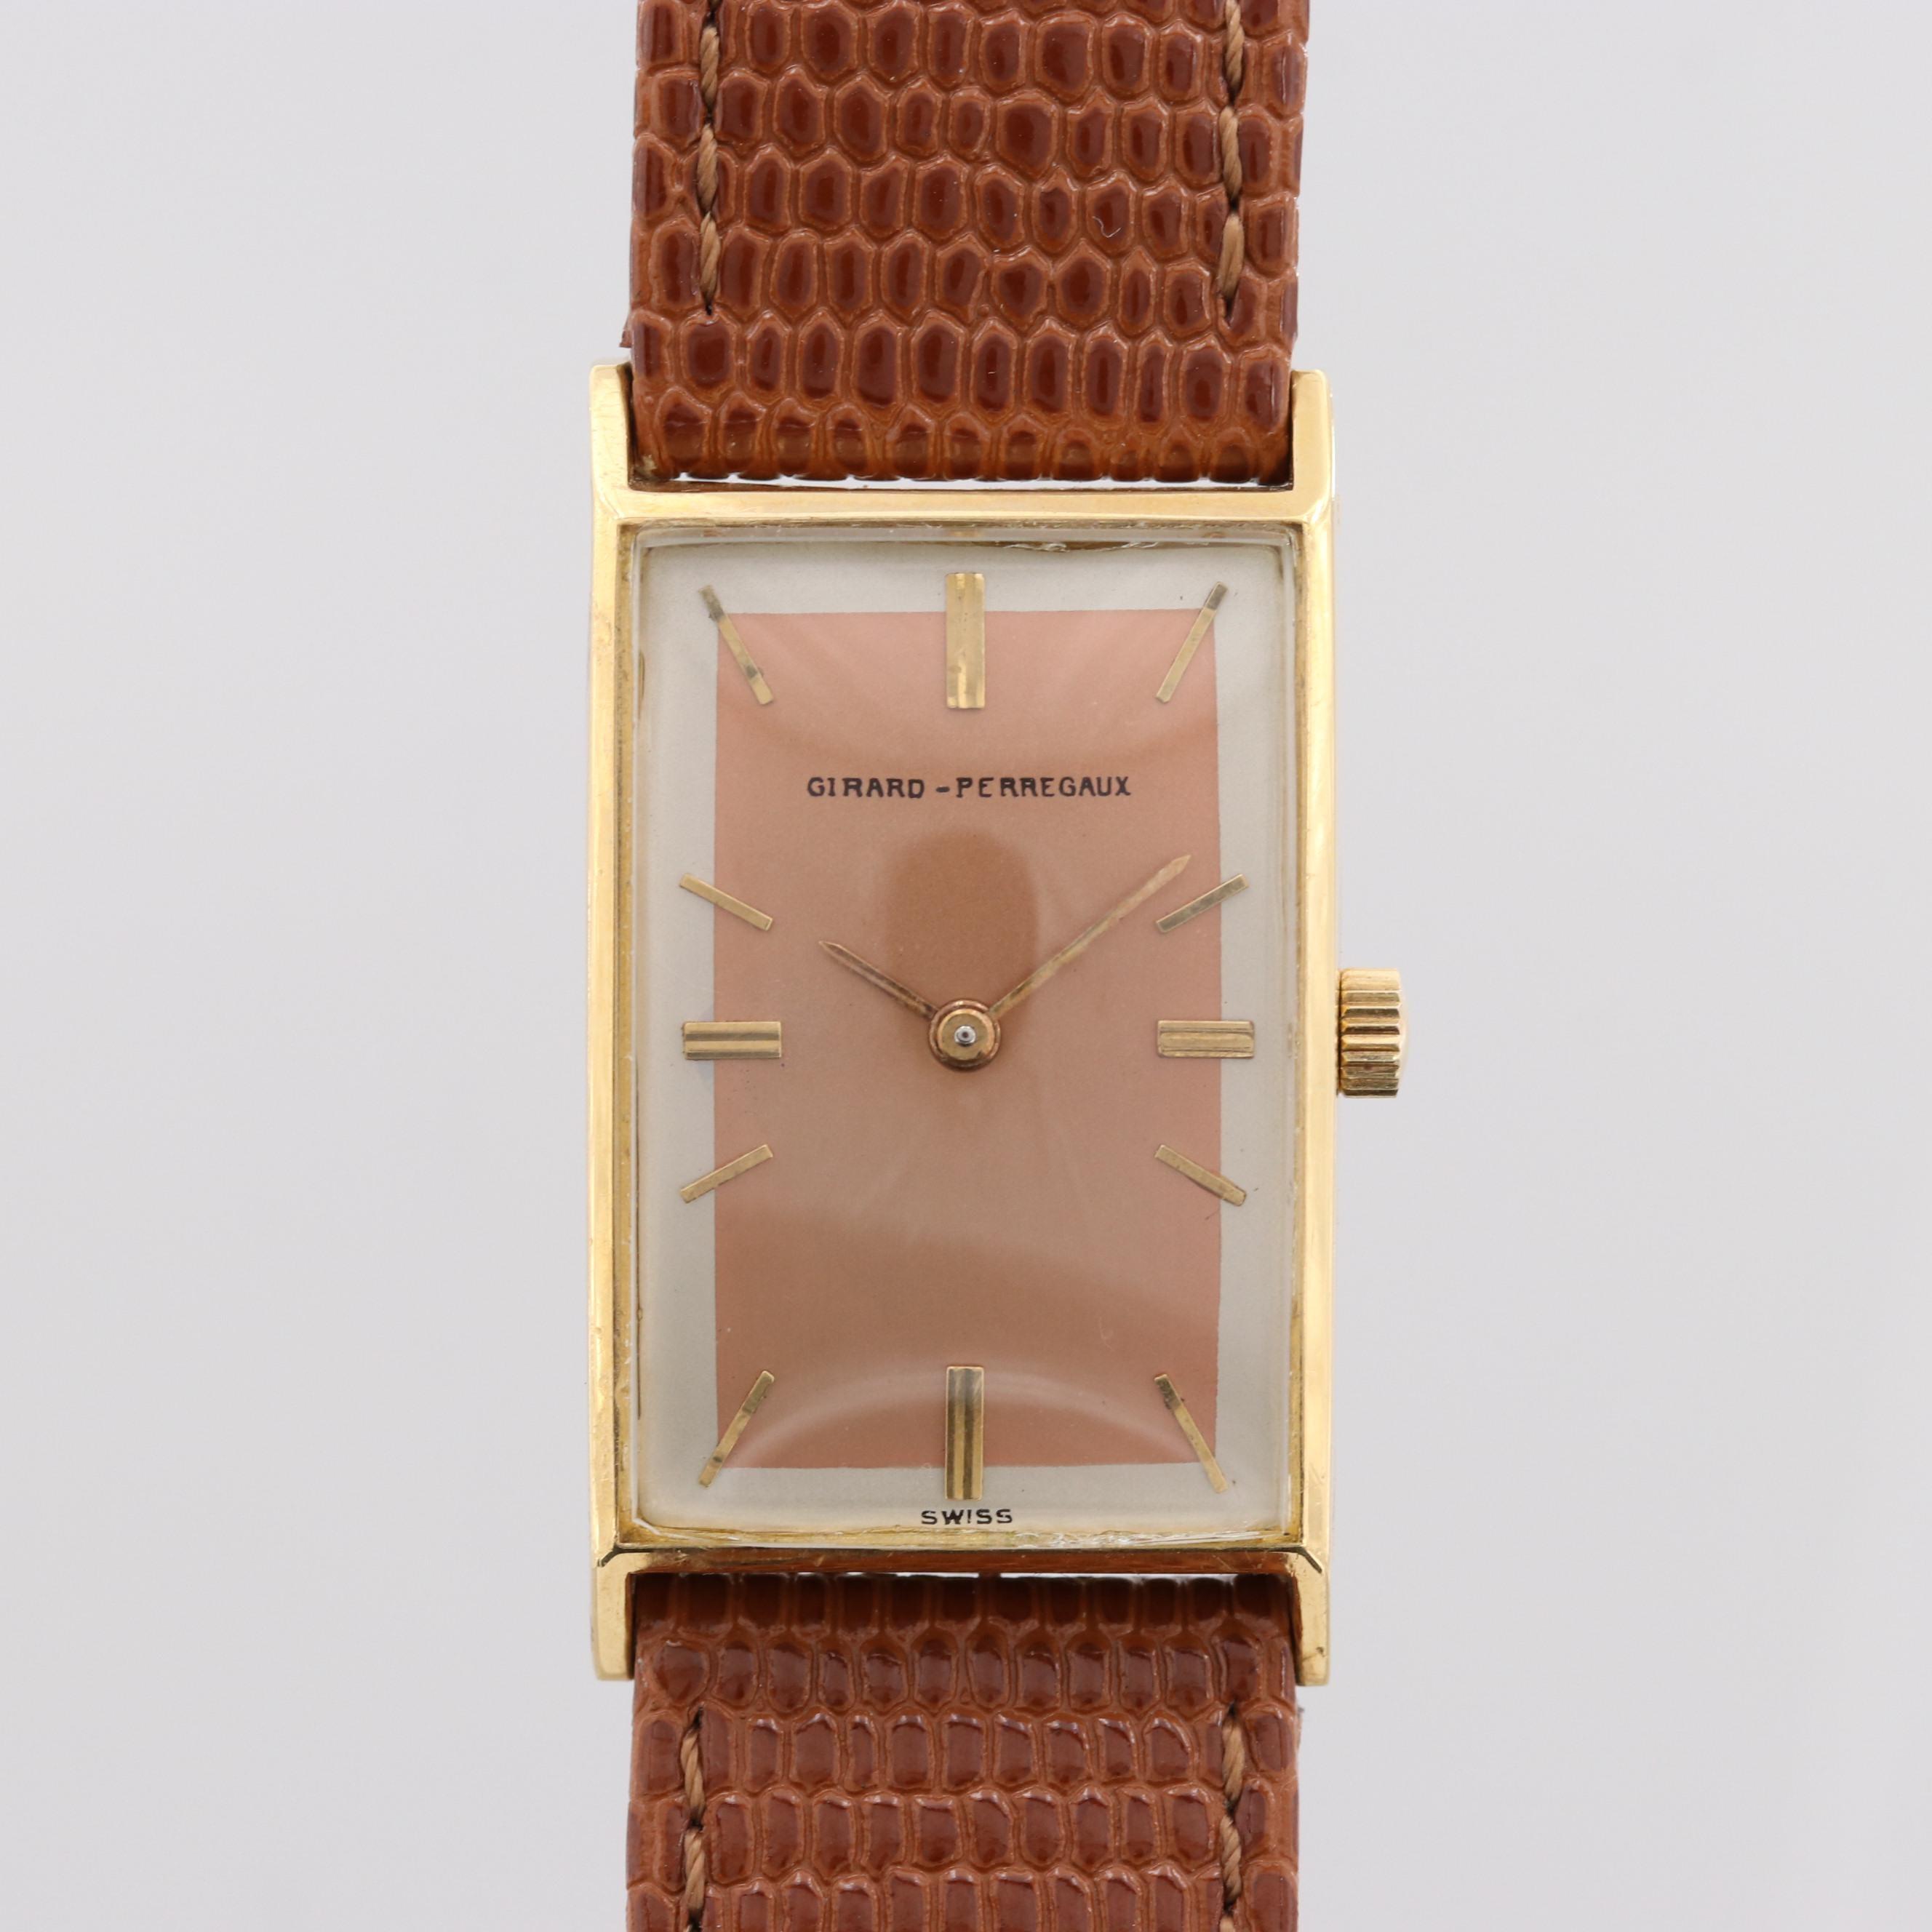 Vintage Girard - Perregaux 18K Yellow Gold Stem Wind Wristwatch